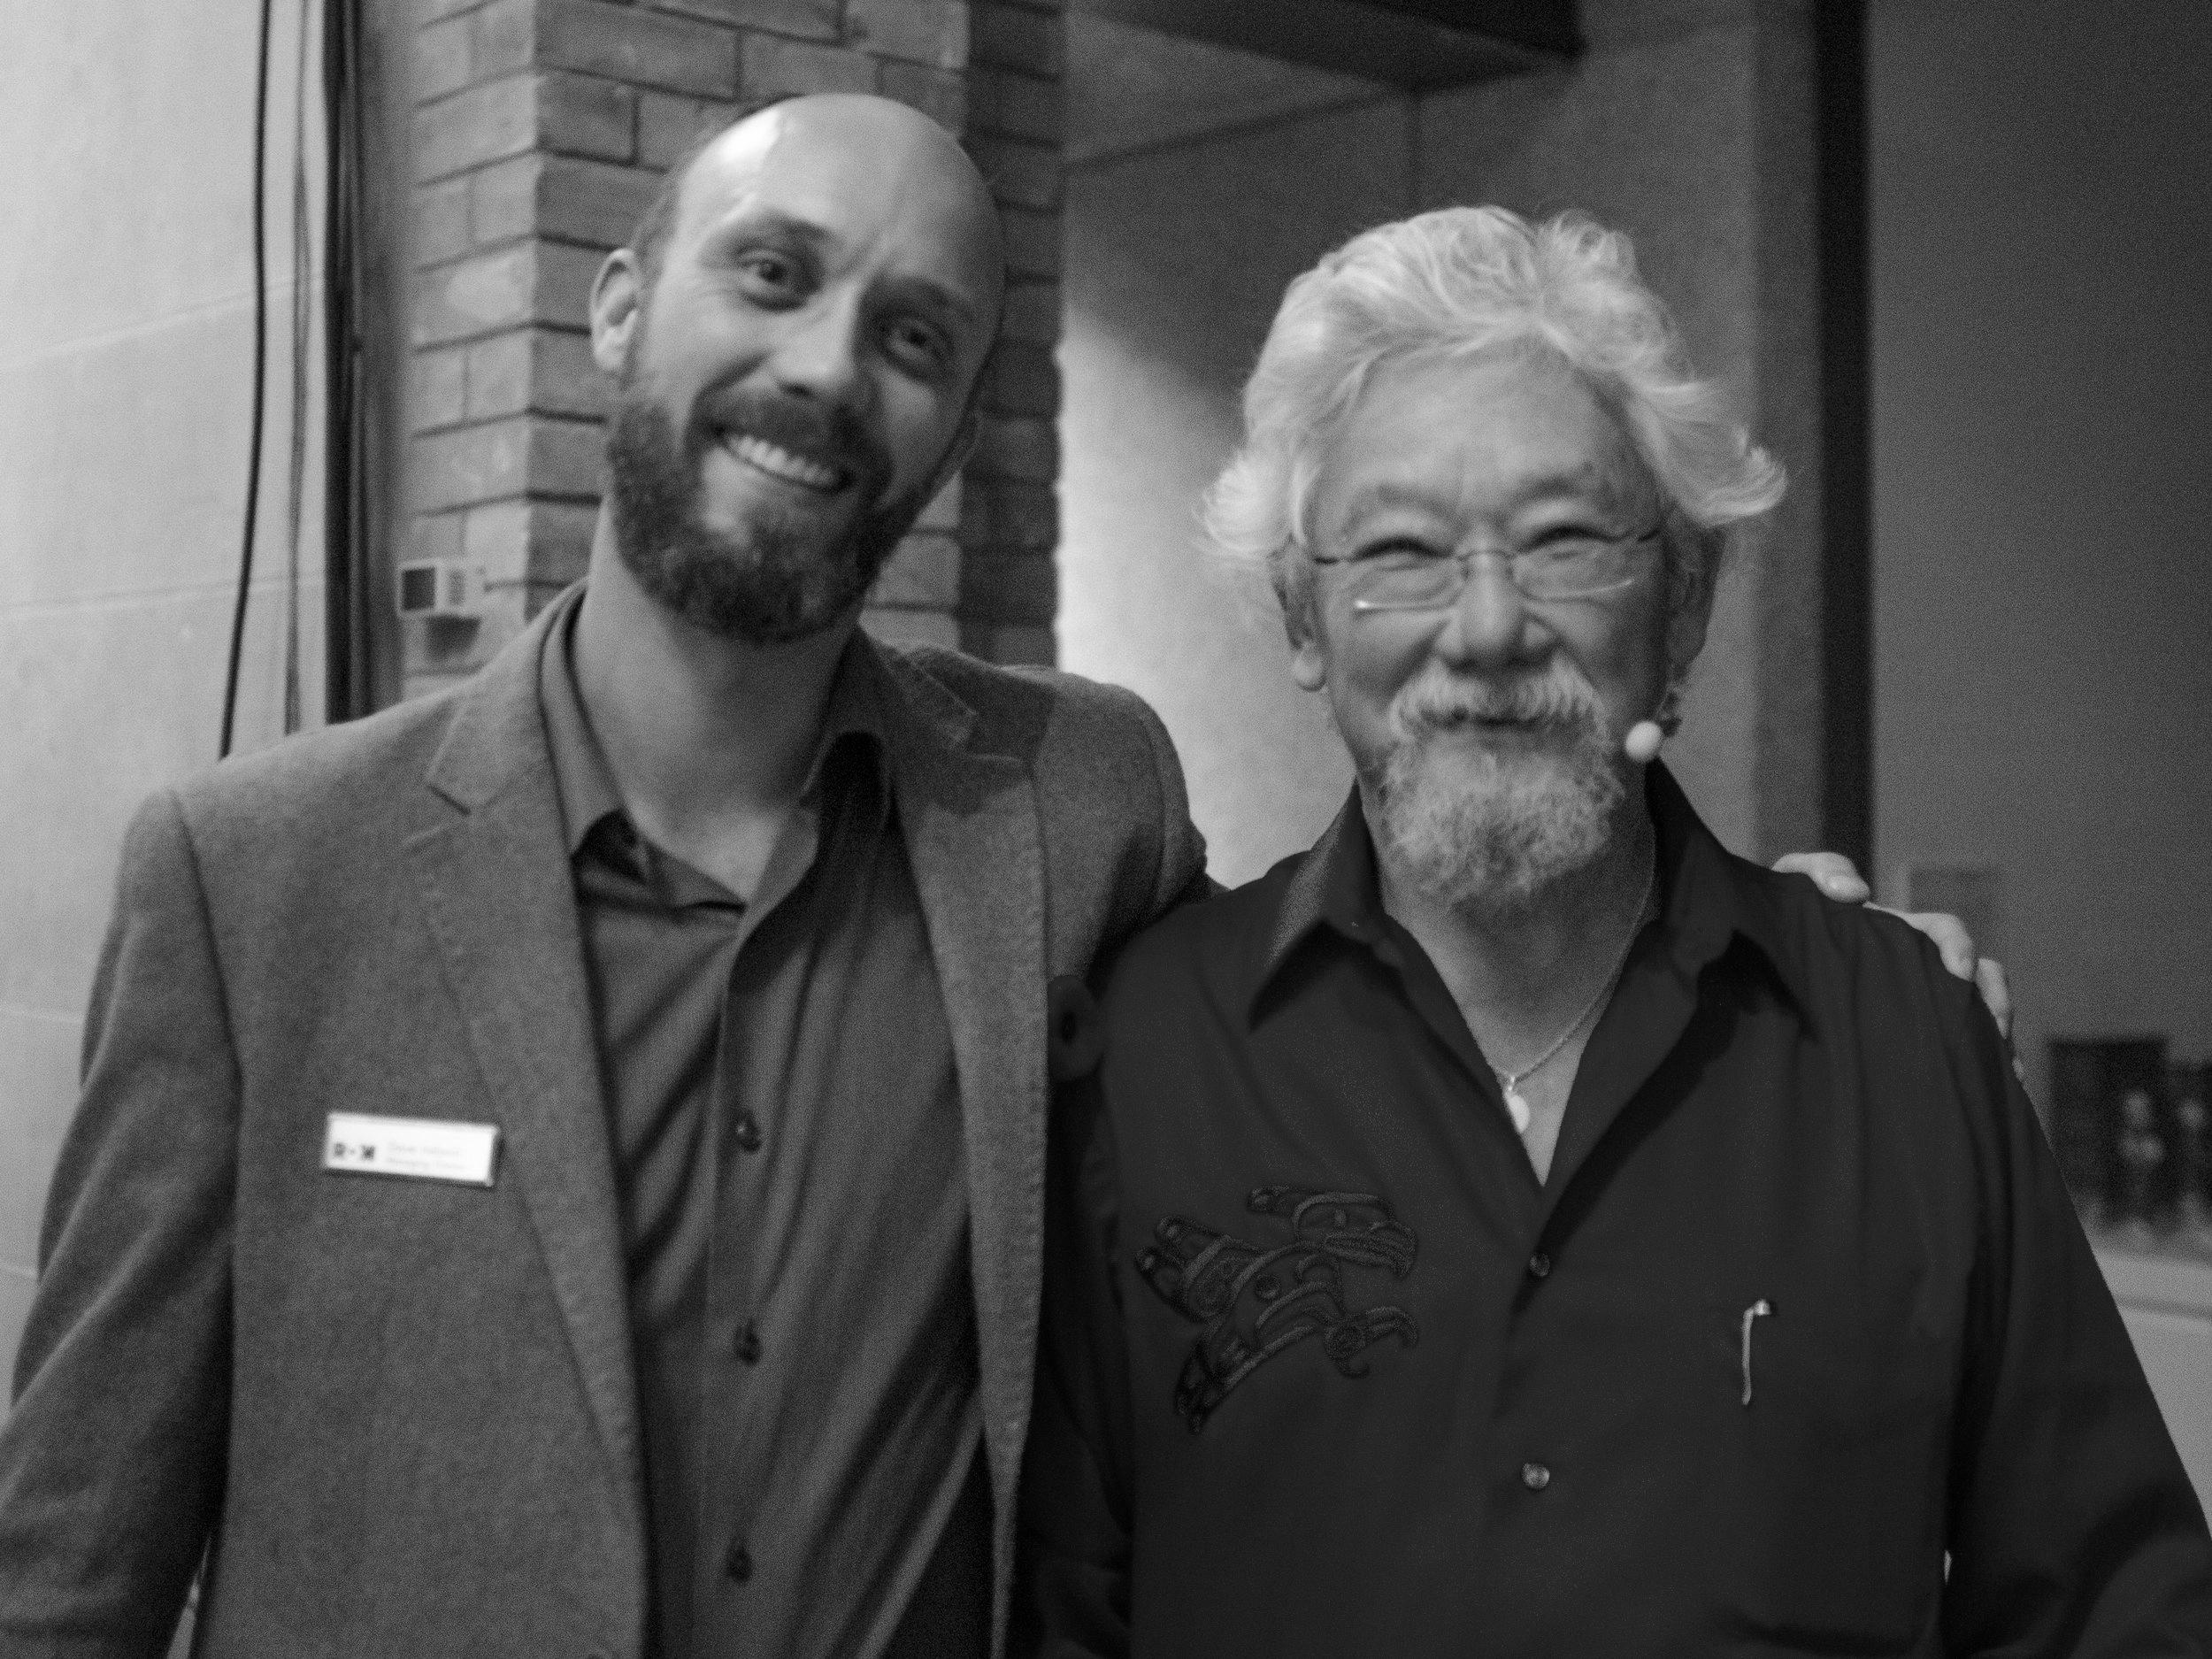 Dave Ireland and David Suzuki, Environmental Activist Image by Stacey Kerr